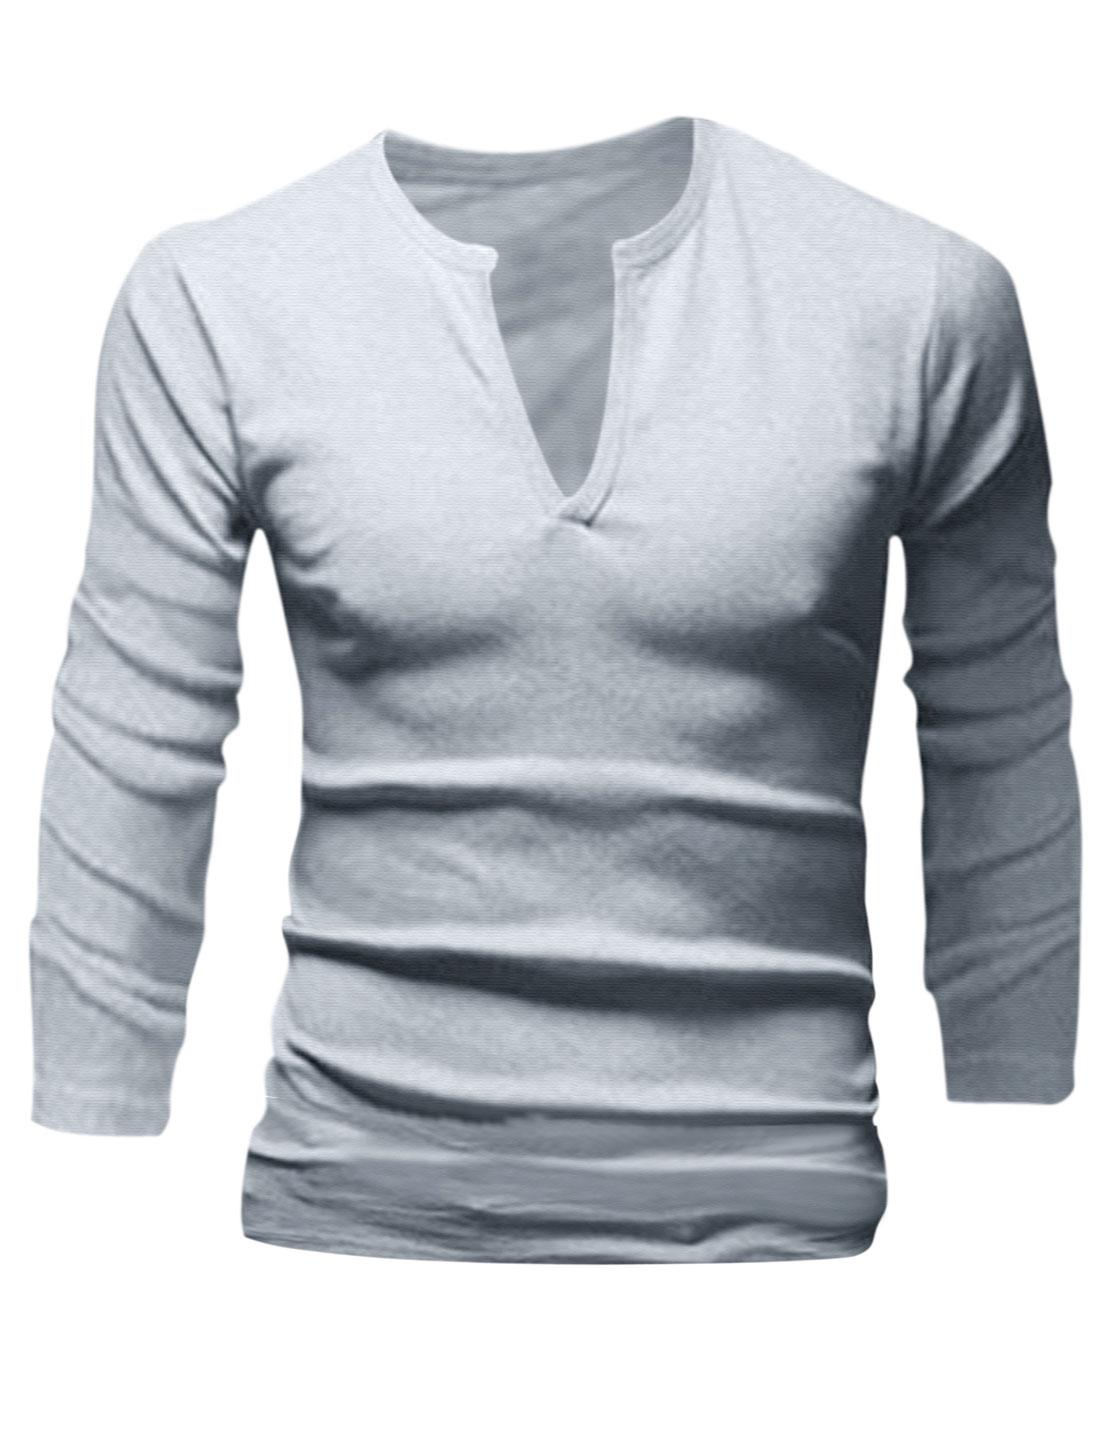 Men Pullover Split Neck Fashionbale Casual Shirt Light Gray M